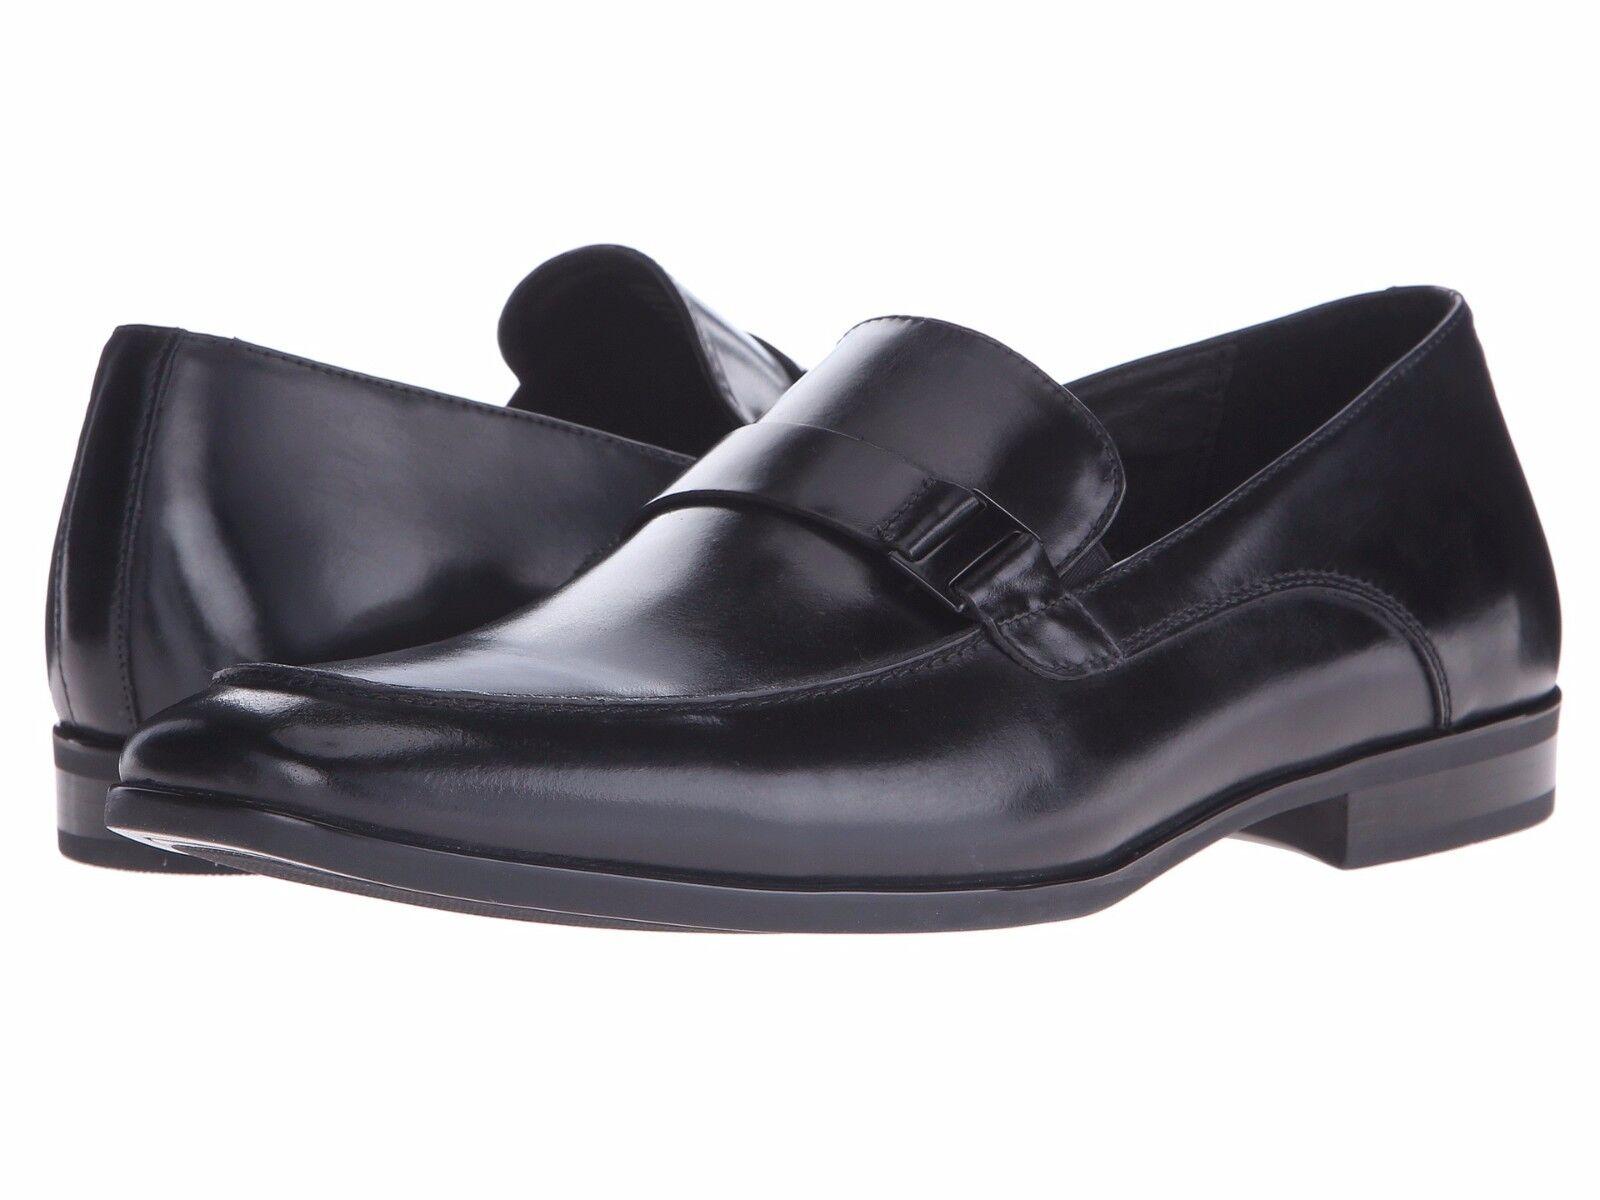 Scarpe casual uomo da uomo casual  Kenneth Cole New York uomos Fare Game Bit Strap Business Casual Loafers Shoes 7b2fd2